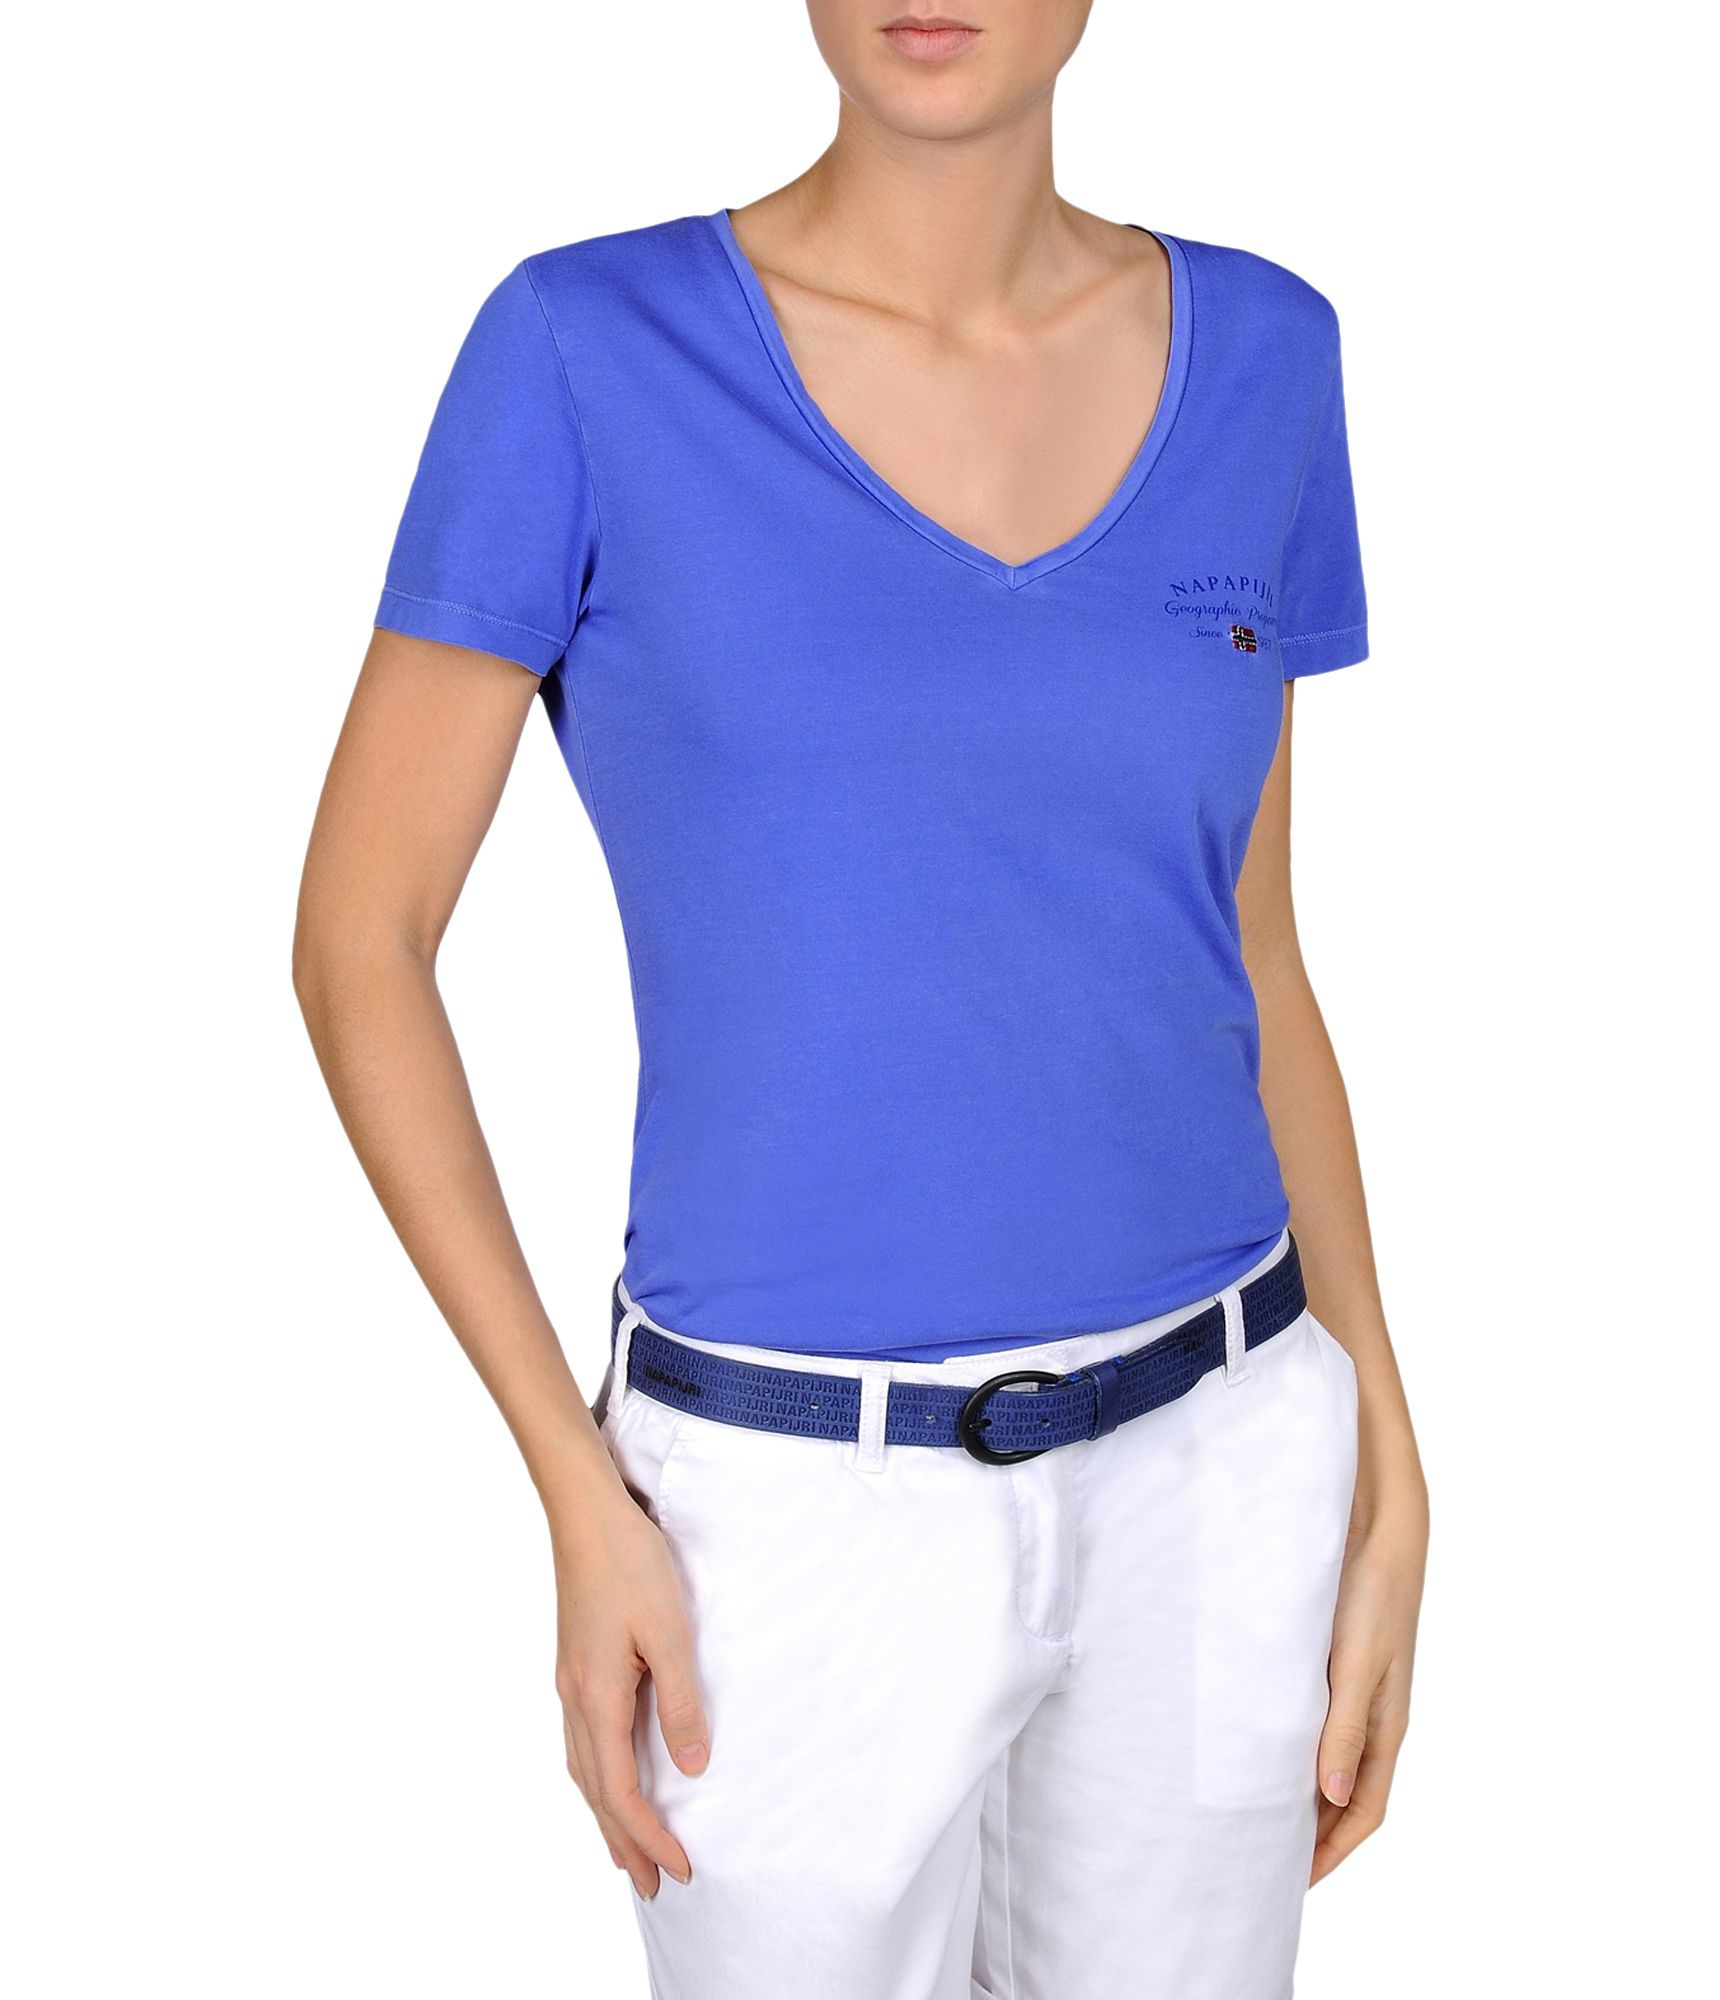 napapijri short sleeve t shirt in blue lyst. Black Bedroom Furniture Sets. Home Design Ideas